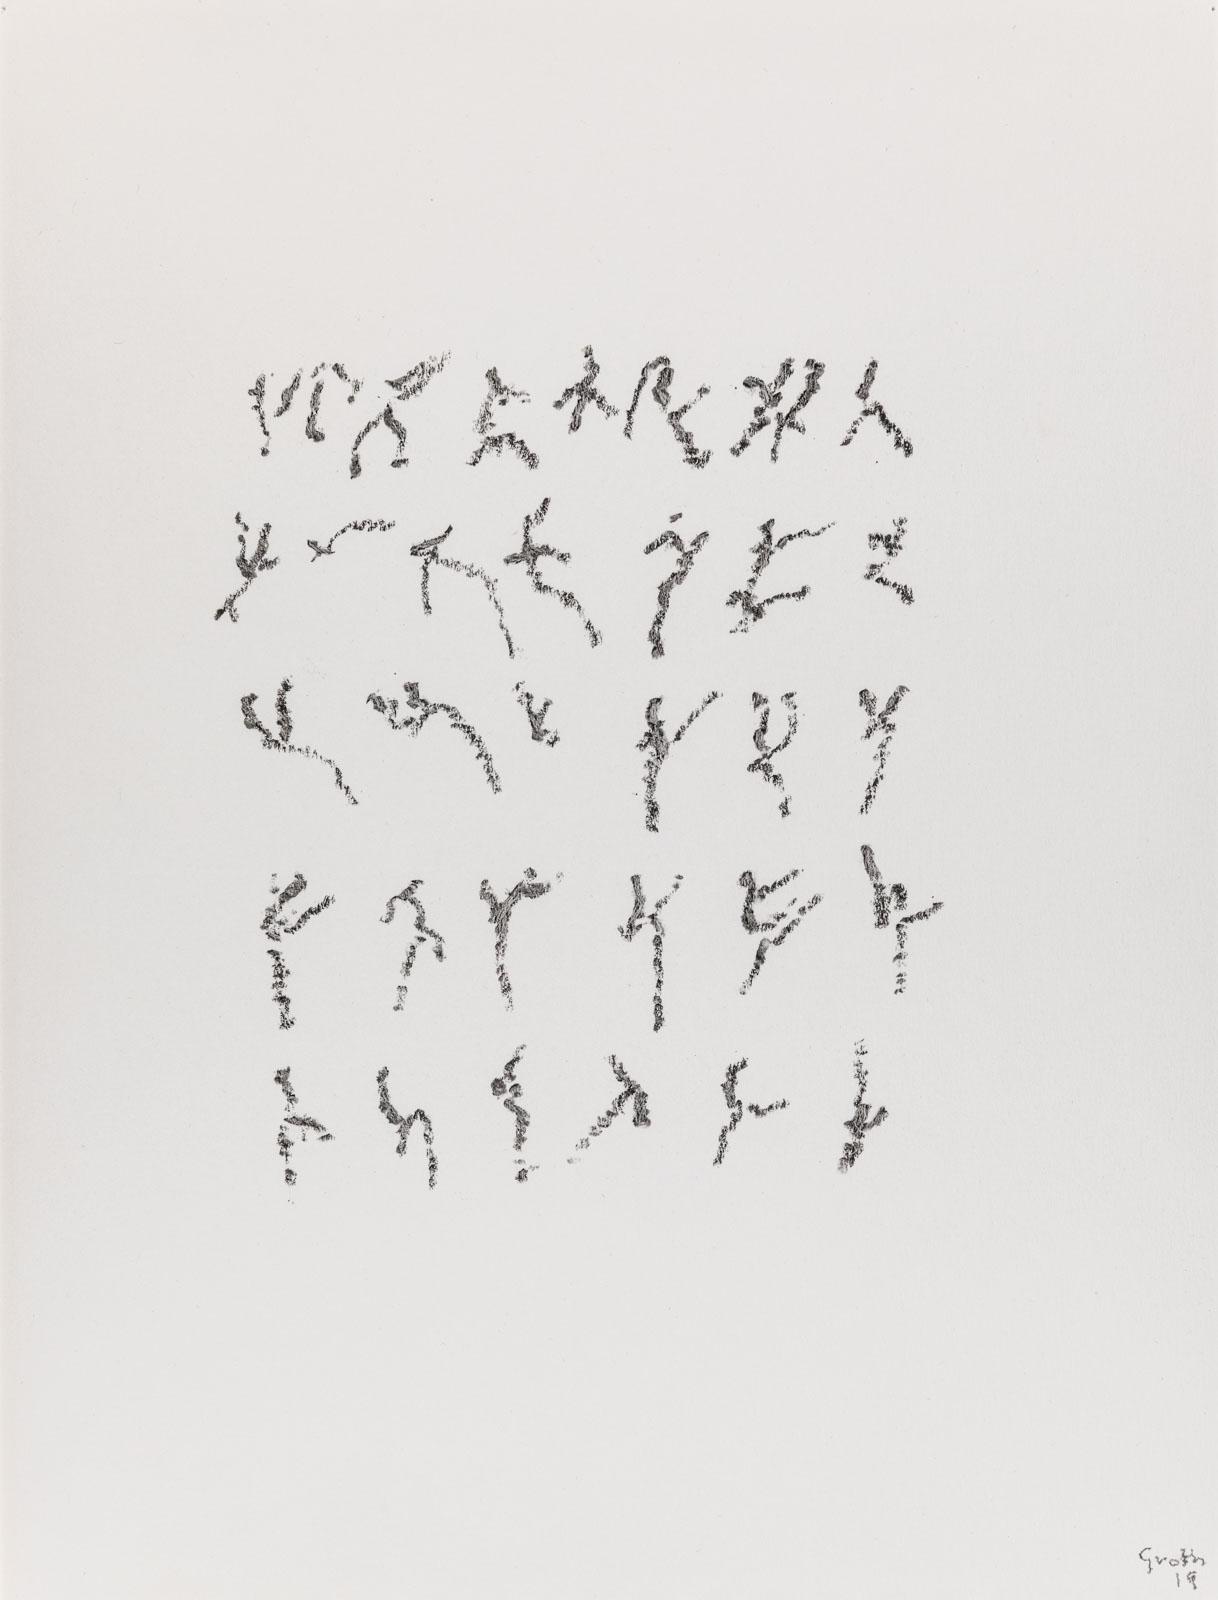 Untitled, 2019. Crayon on paper, custom frame with UV/AR glass, 27,7 x 21,5 cm (JG ts 1332)